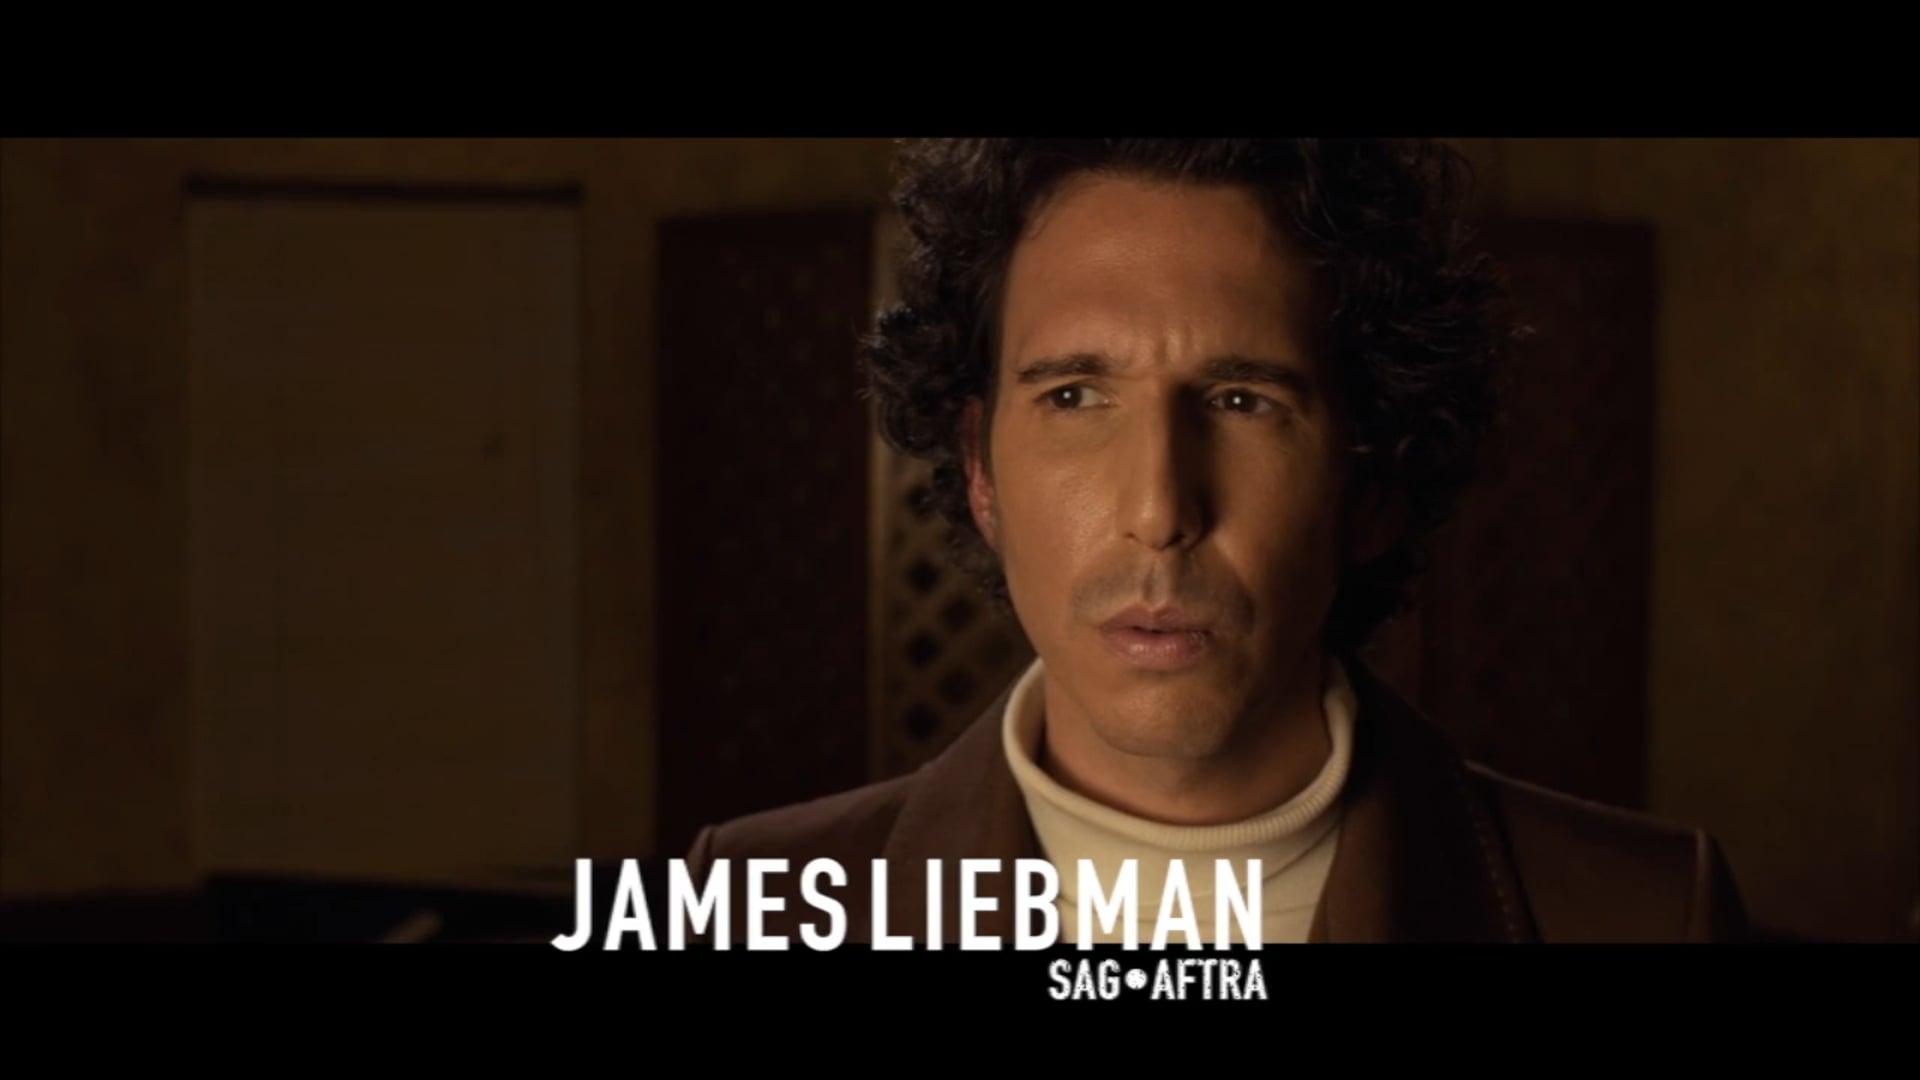 James Liebman Quick Scenes and Shots